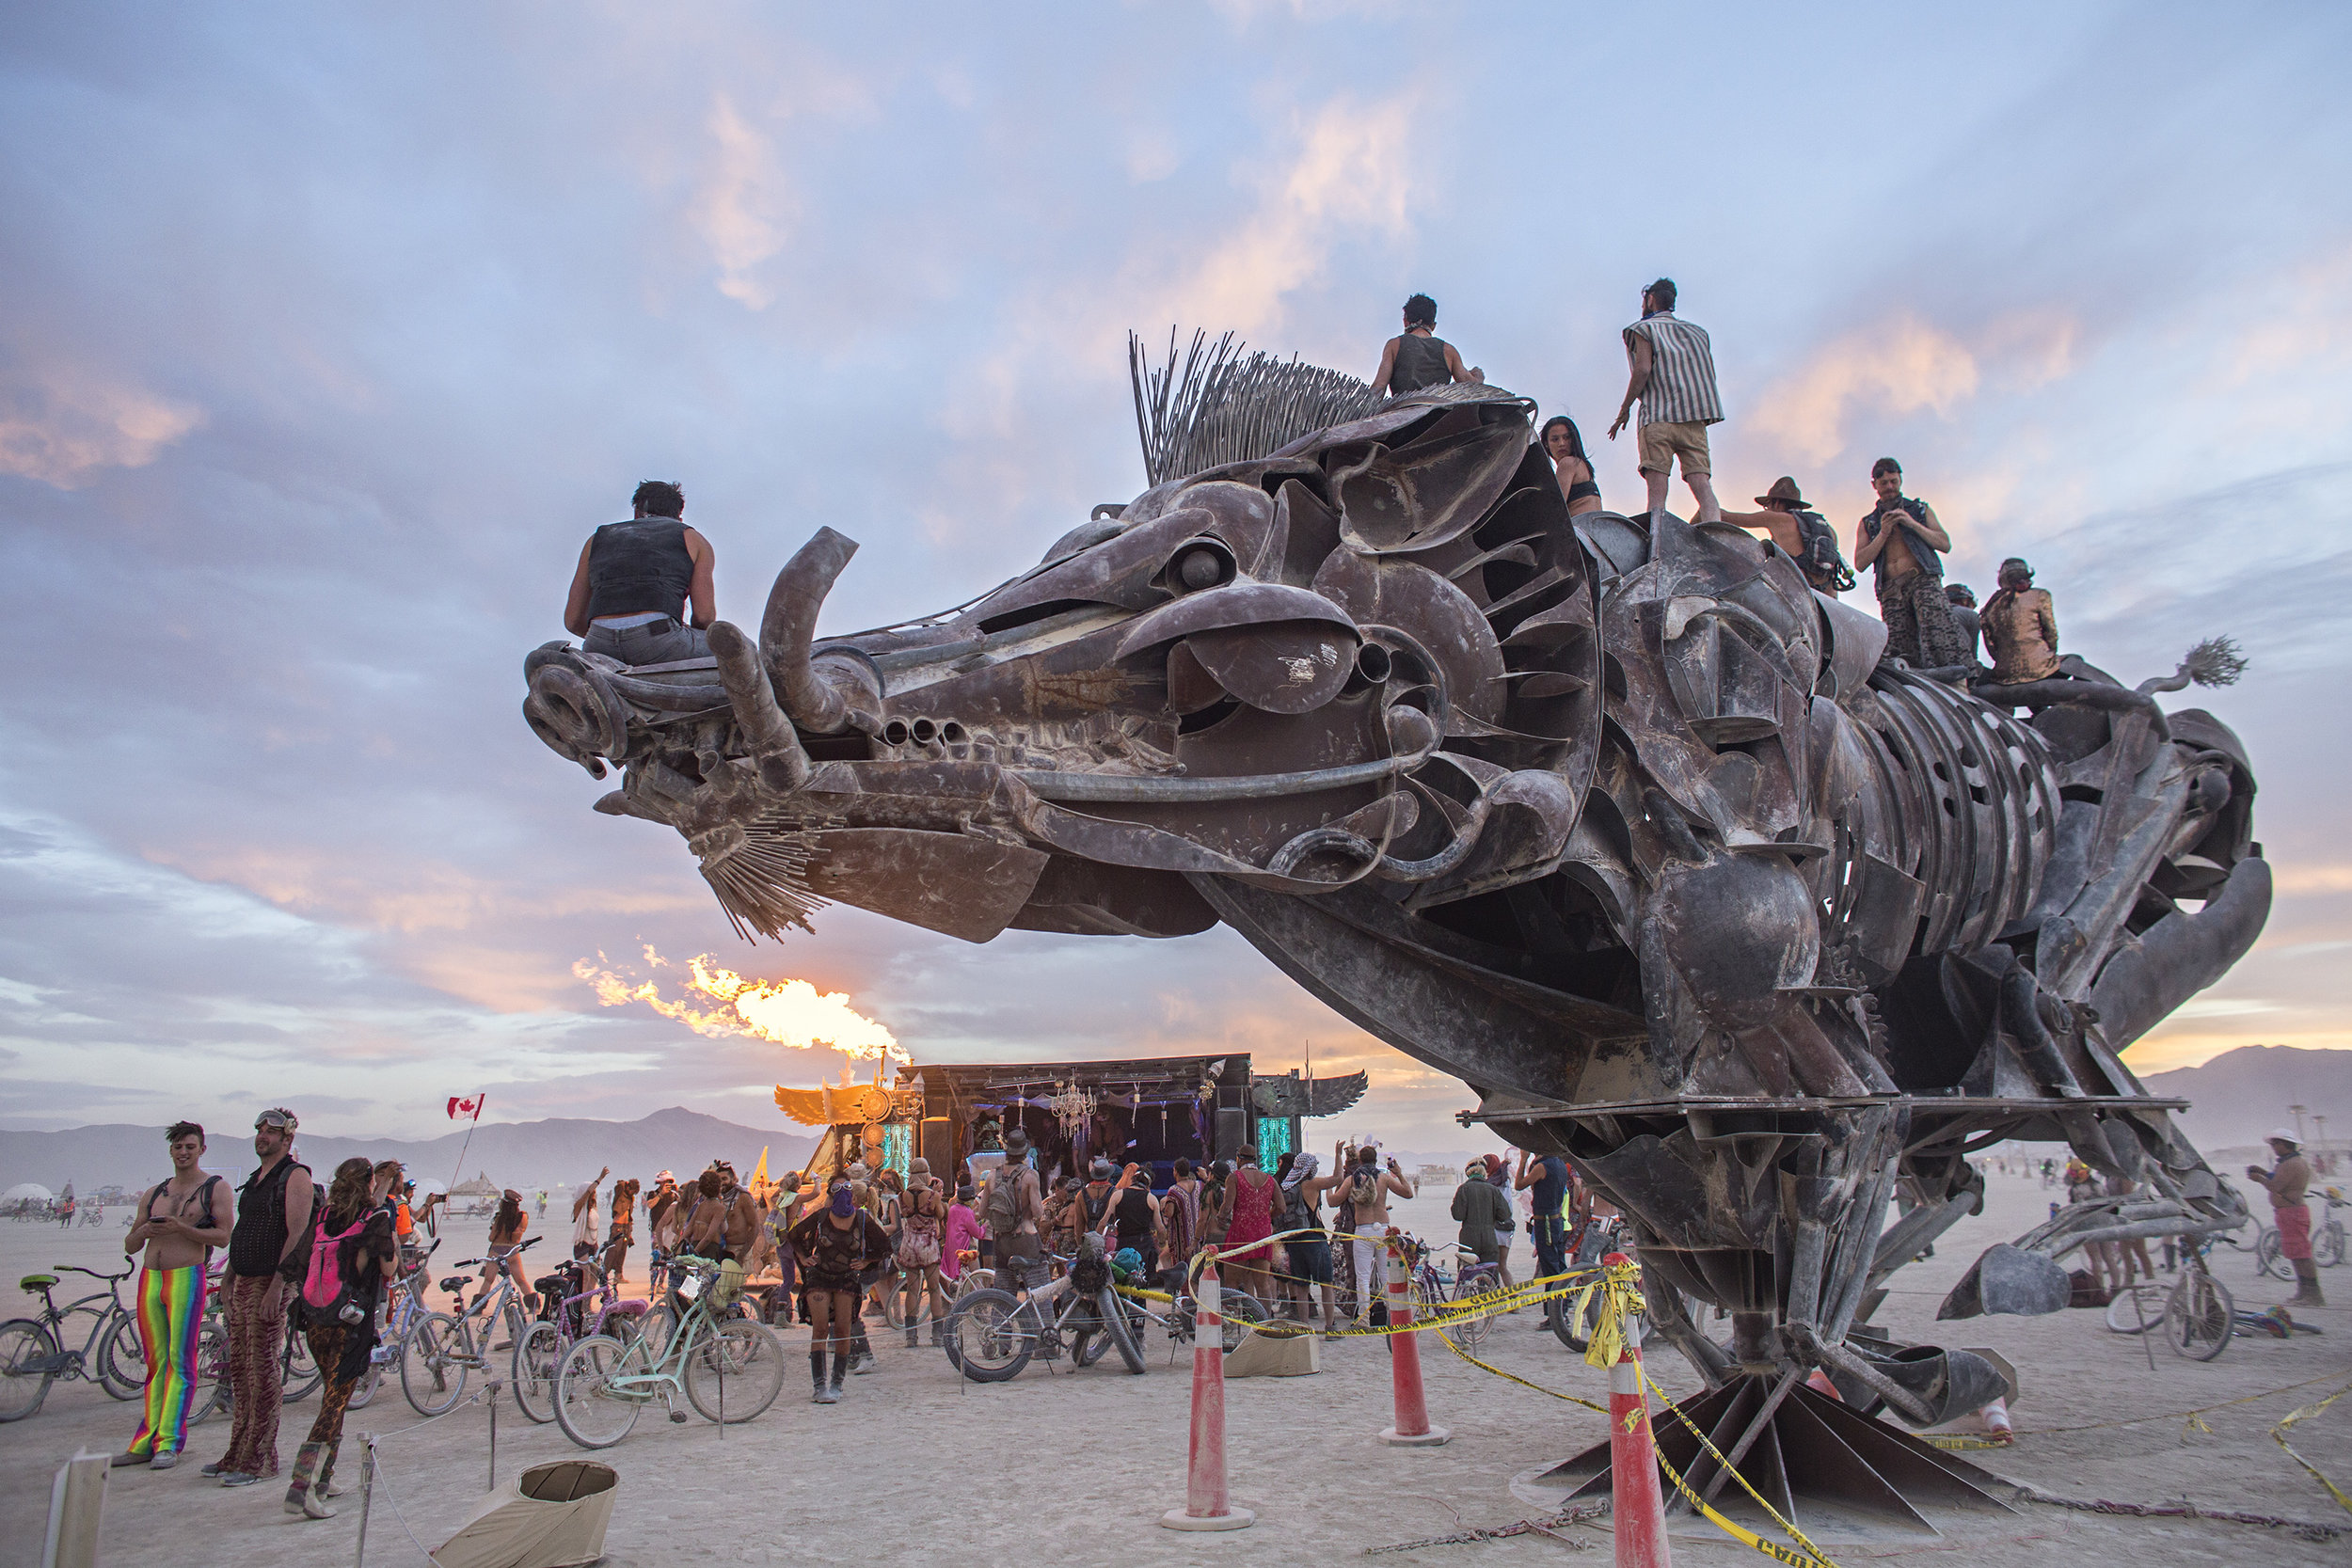 hog-sculpture-burning-man-black-rock-desert-nevada.jpg